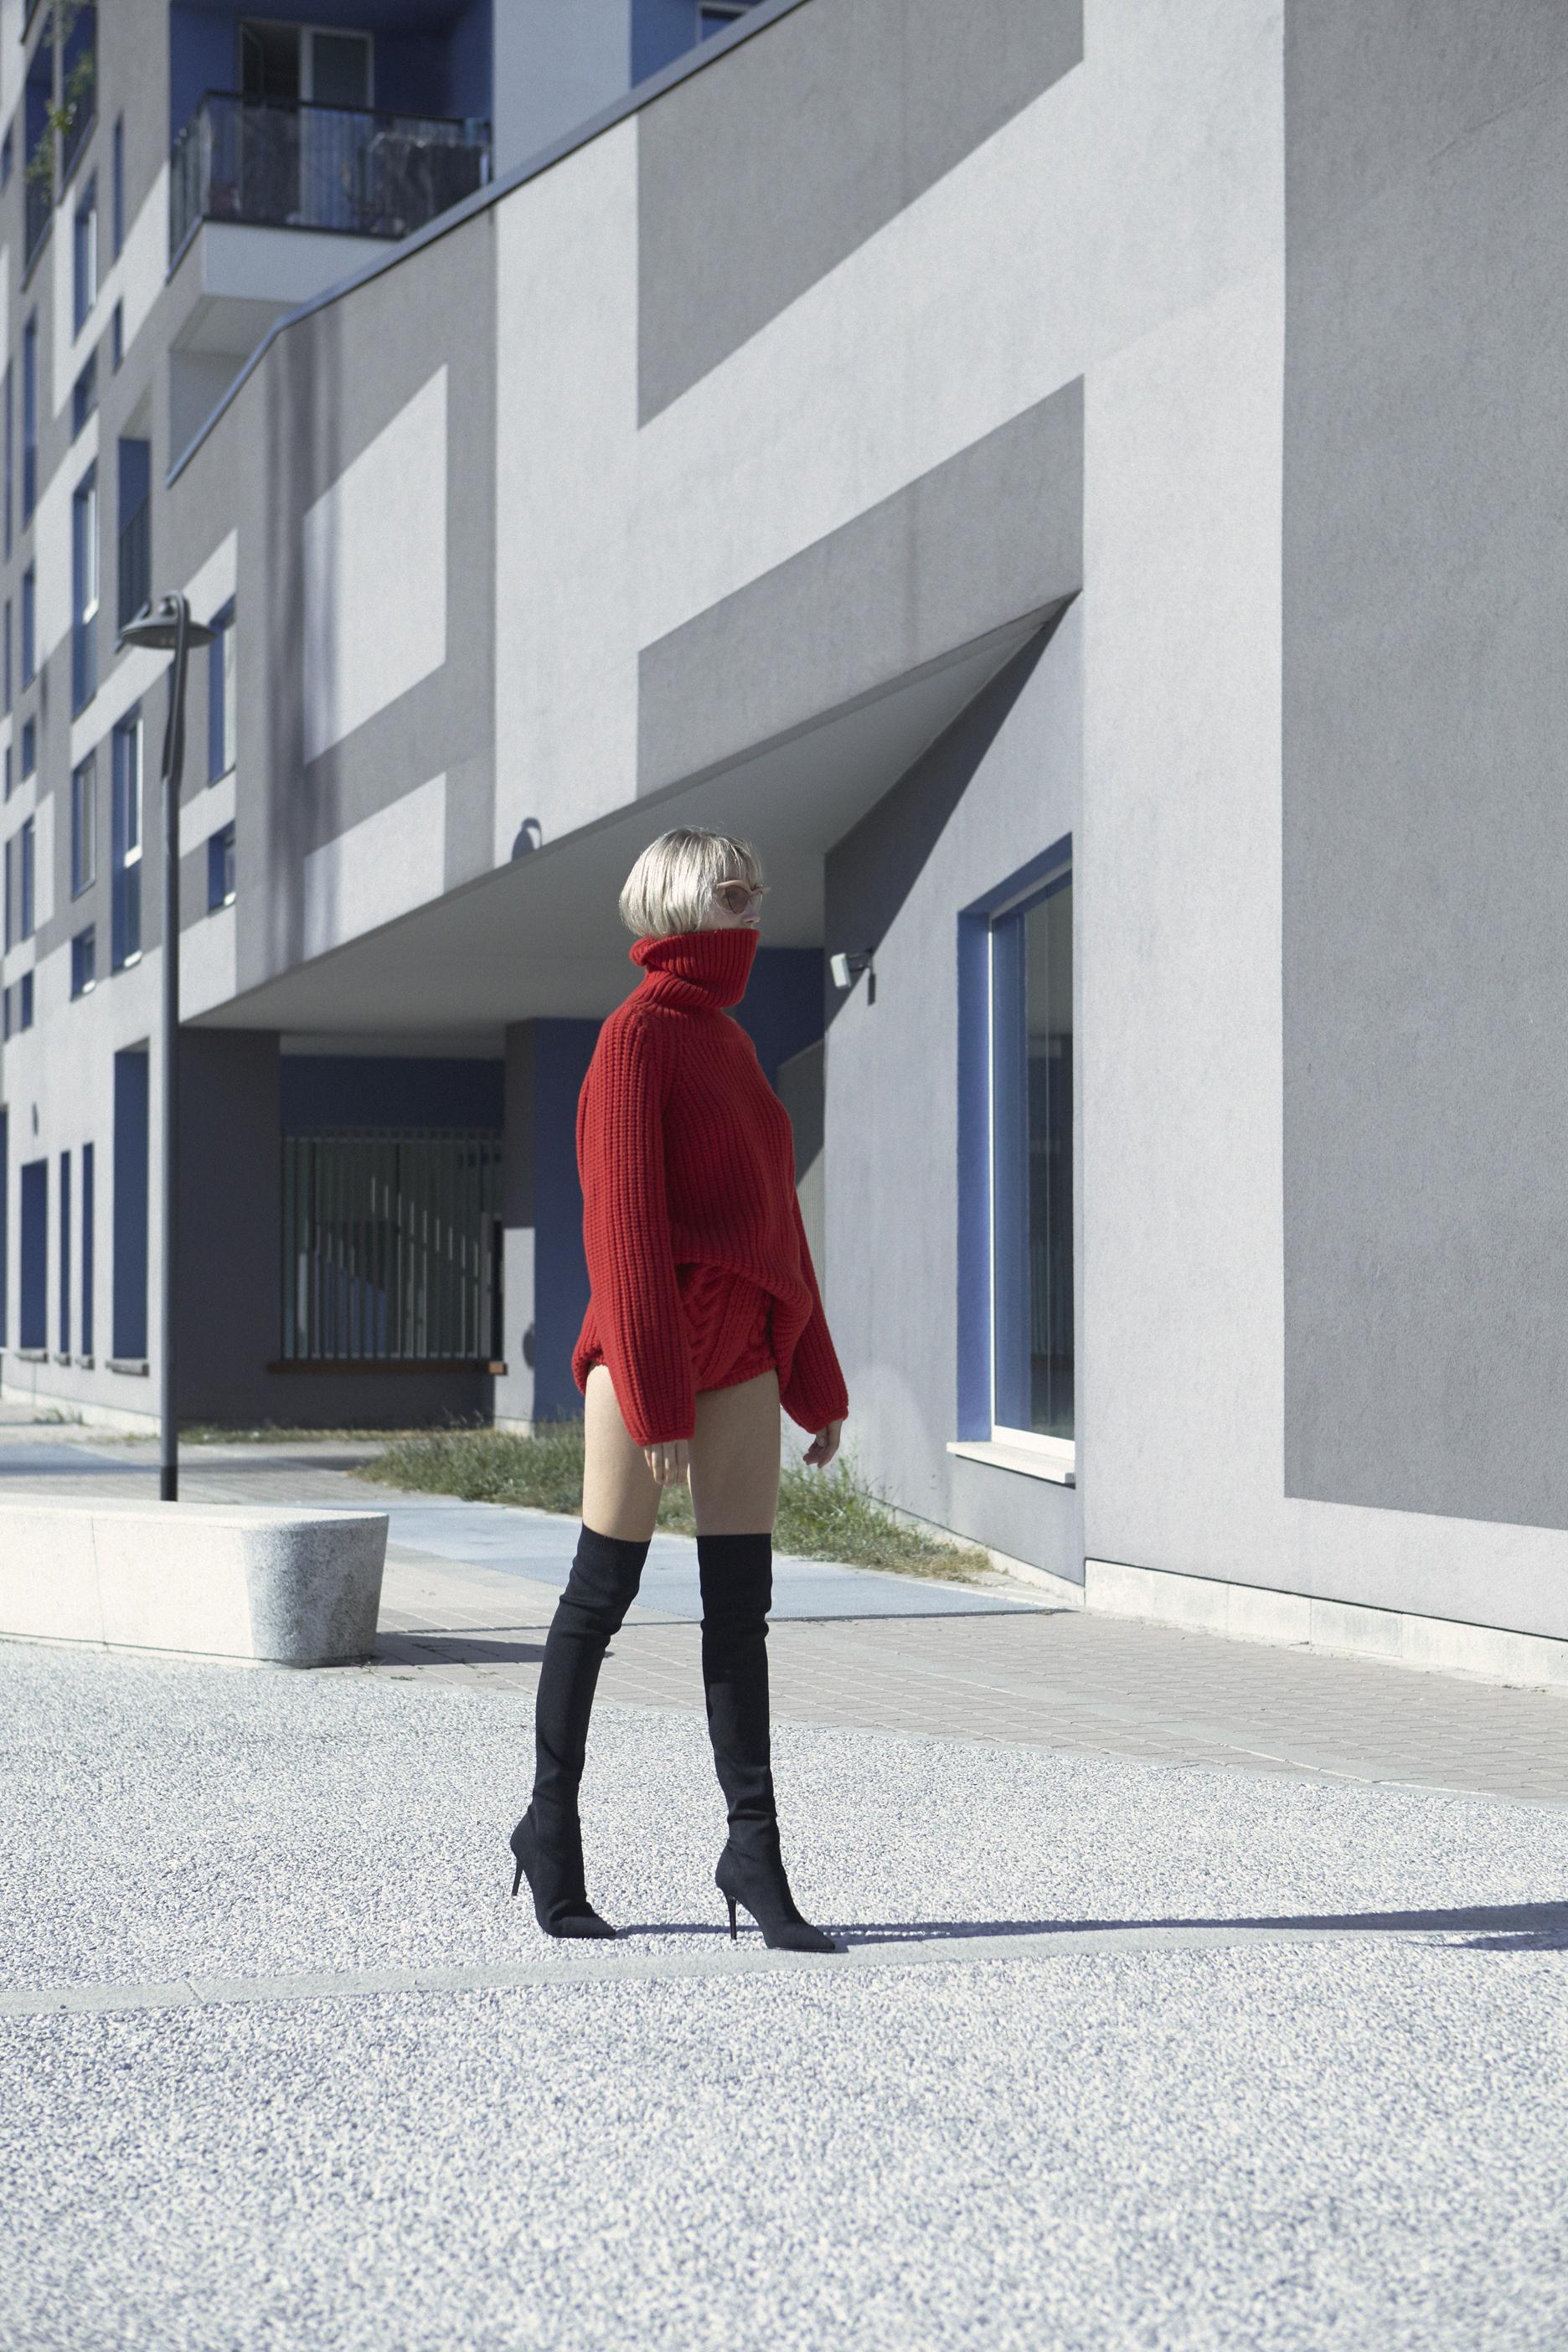 Jumper and culotte 16R Firenze - sunglasses Mykita+MaisonMargiela - Boots Mango